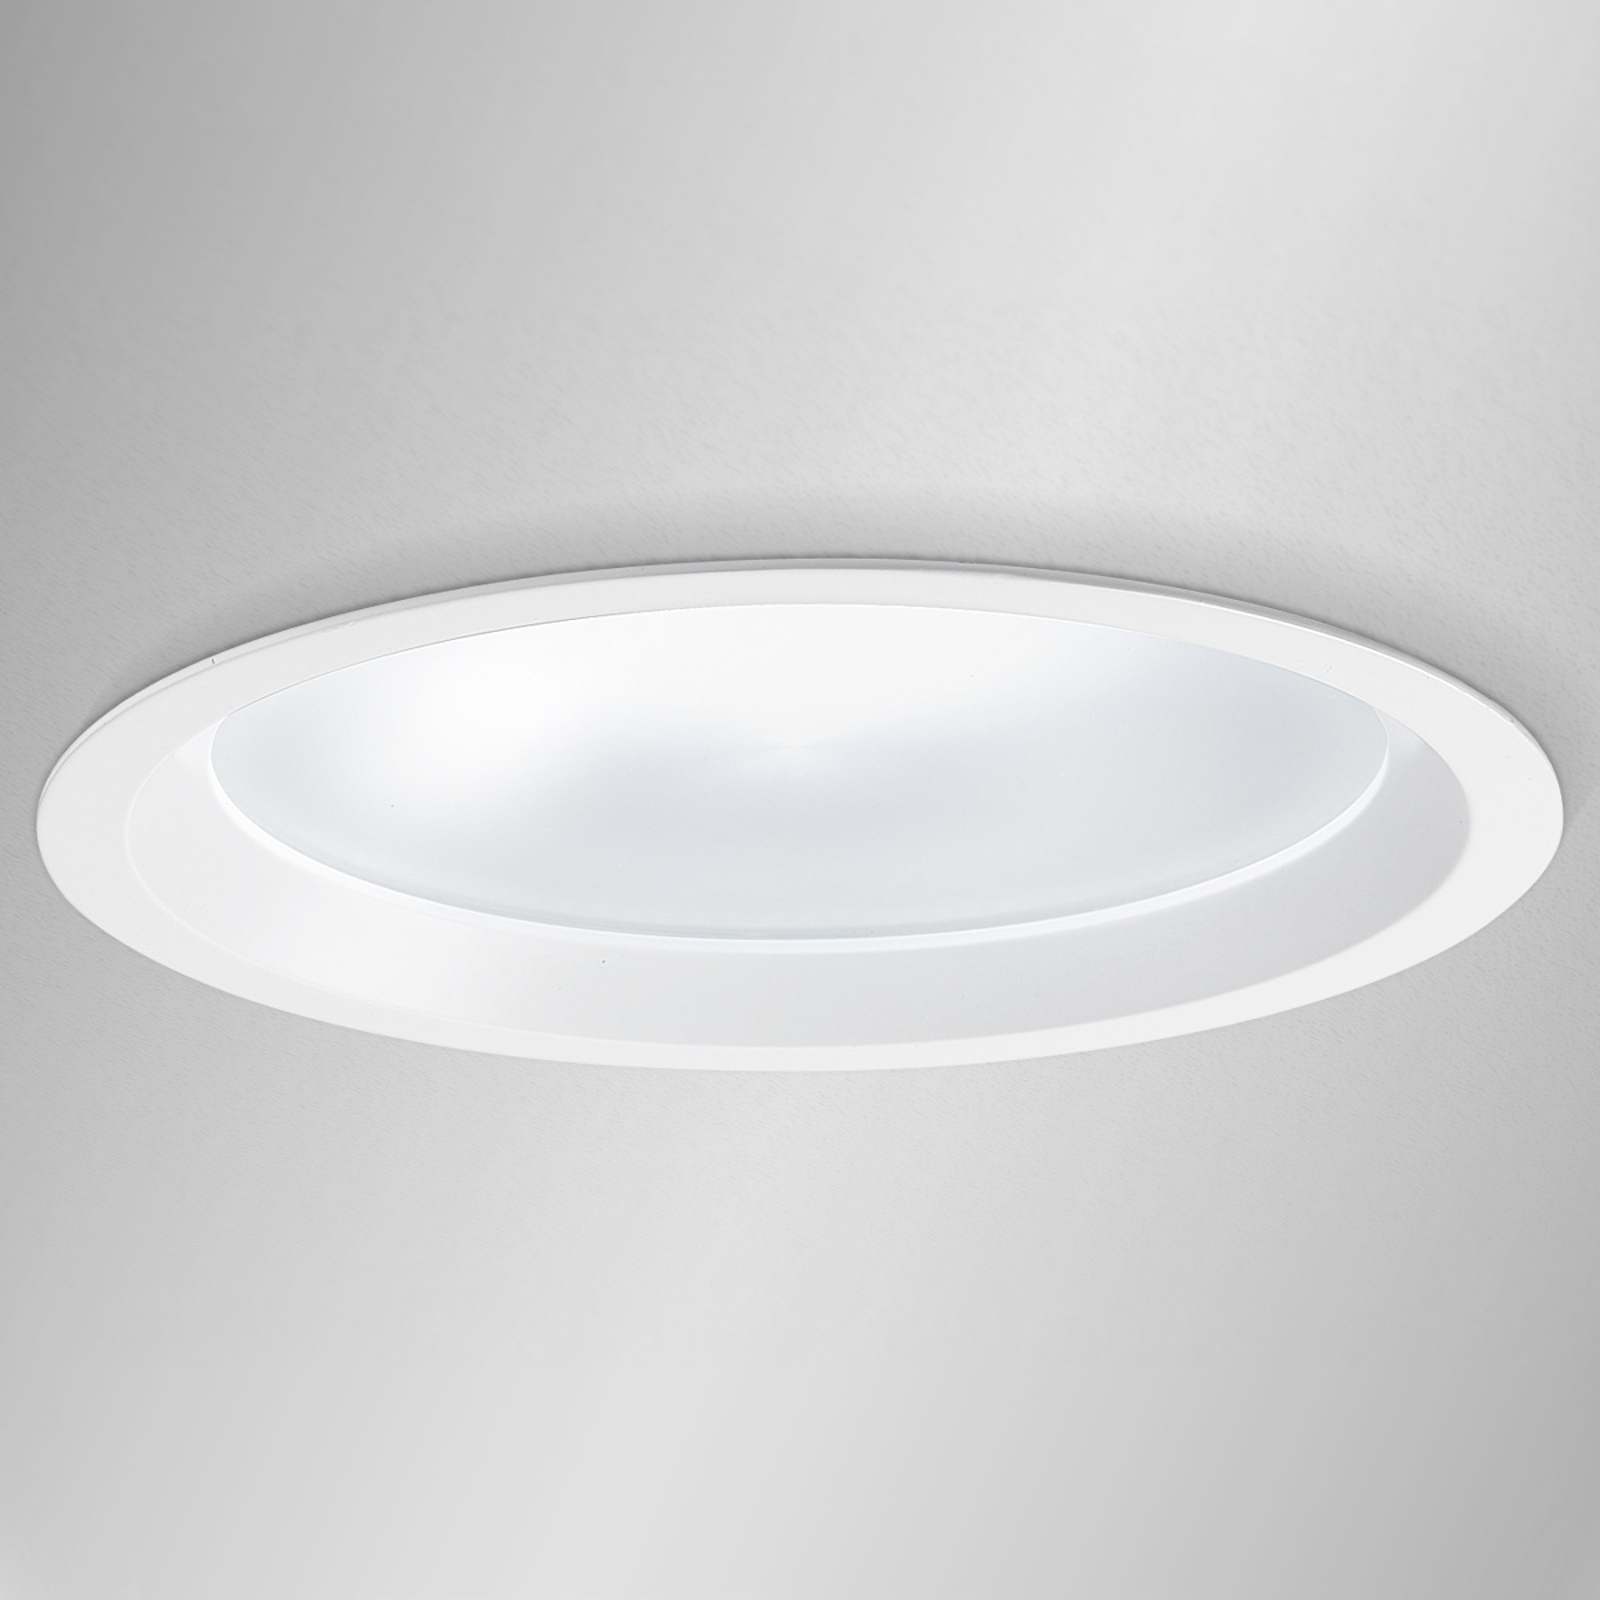 23cm diamètre - downlight encastré LED Strato 230